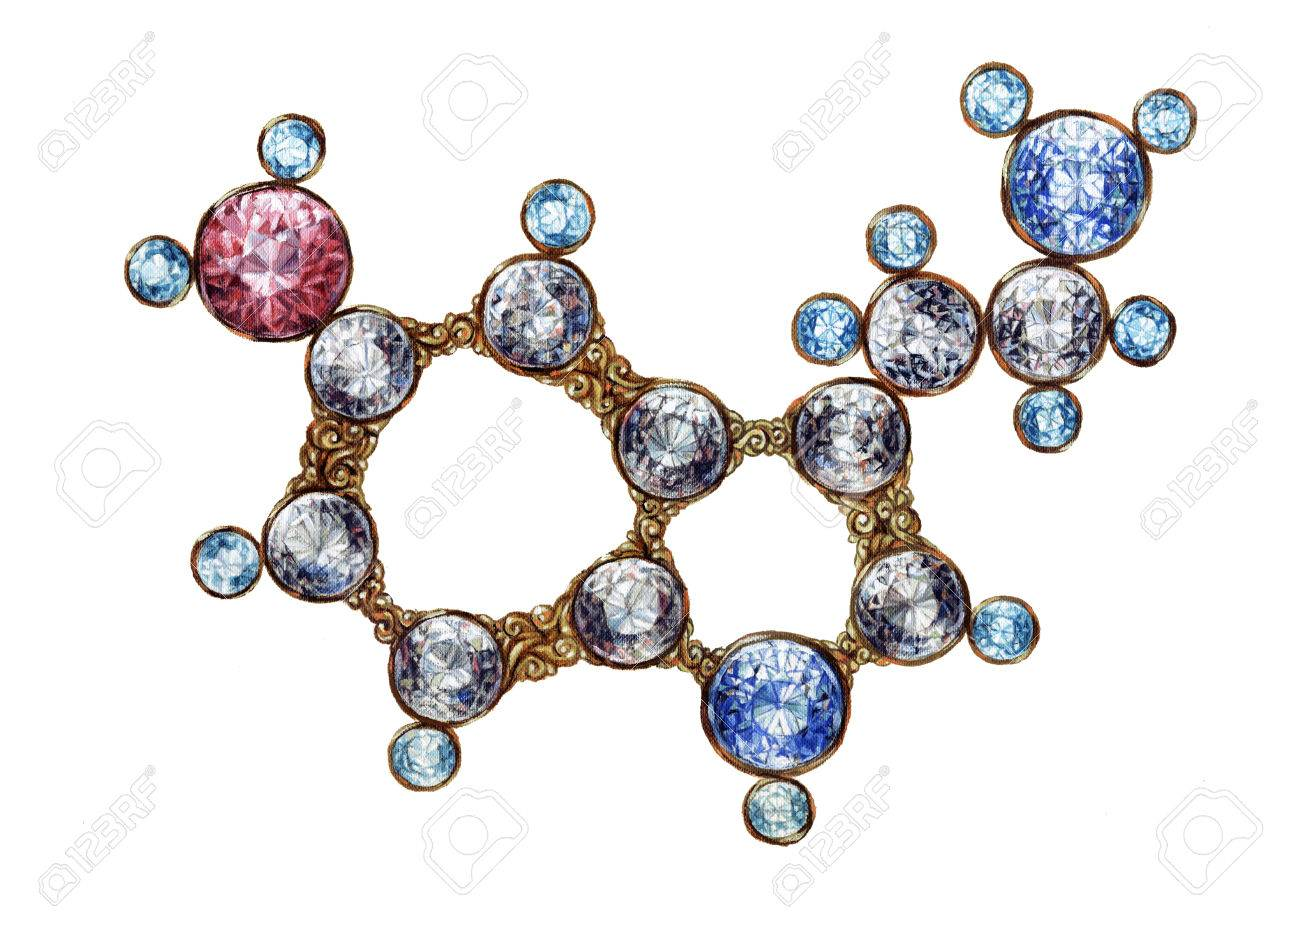 golden serotonin molecule molecular structure with shining gemstones